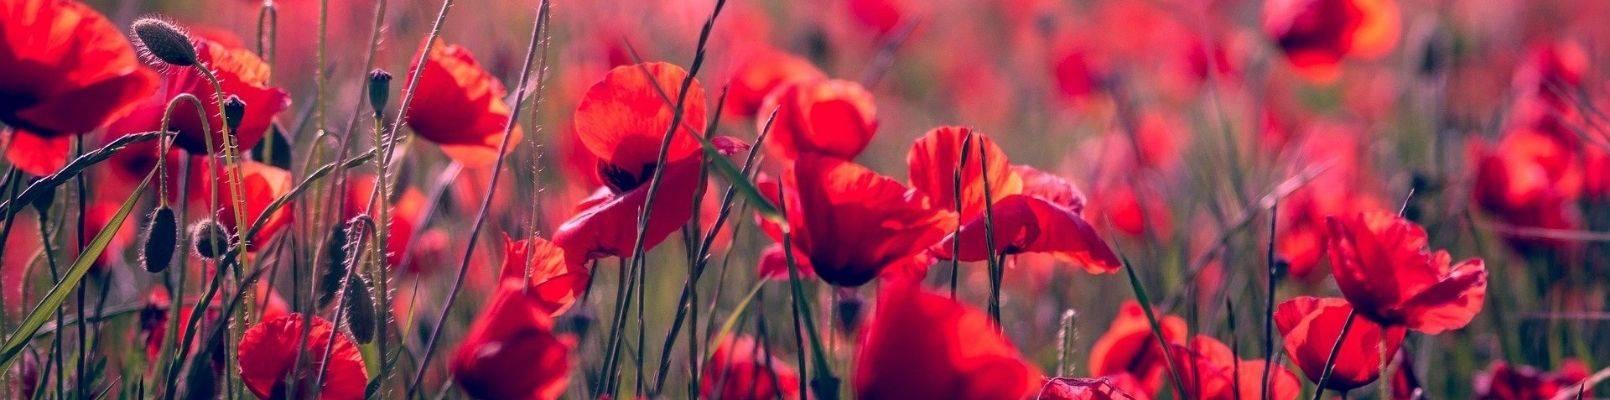 horoscop floral maci